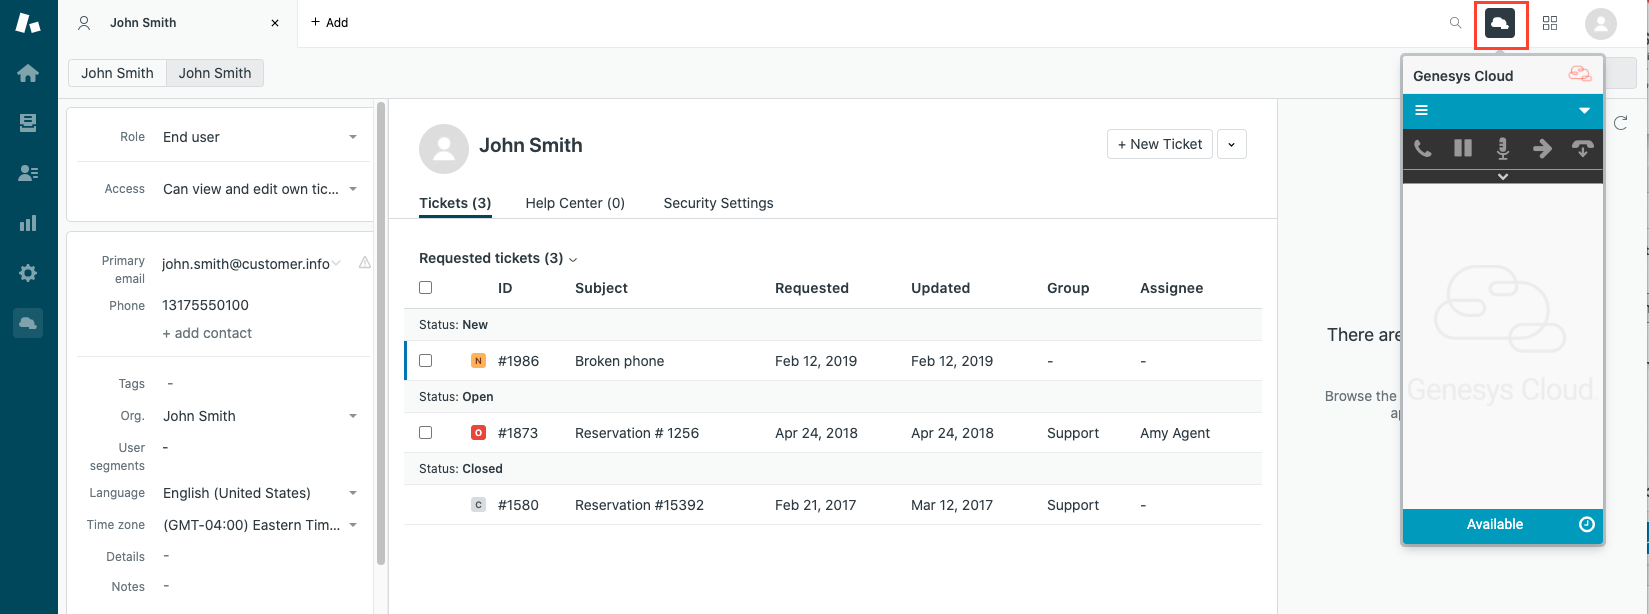 Client access in Zendesk